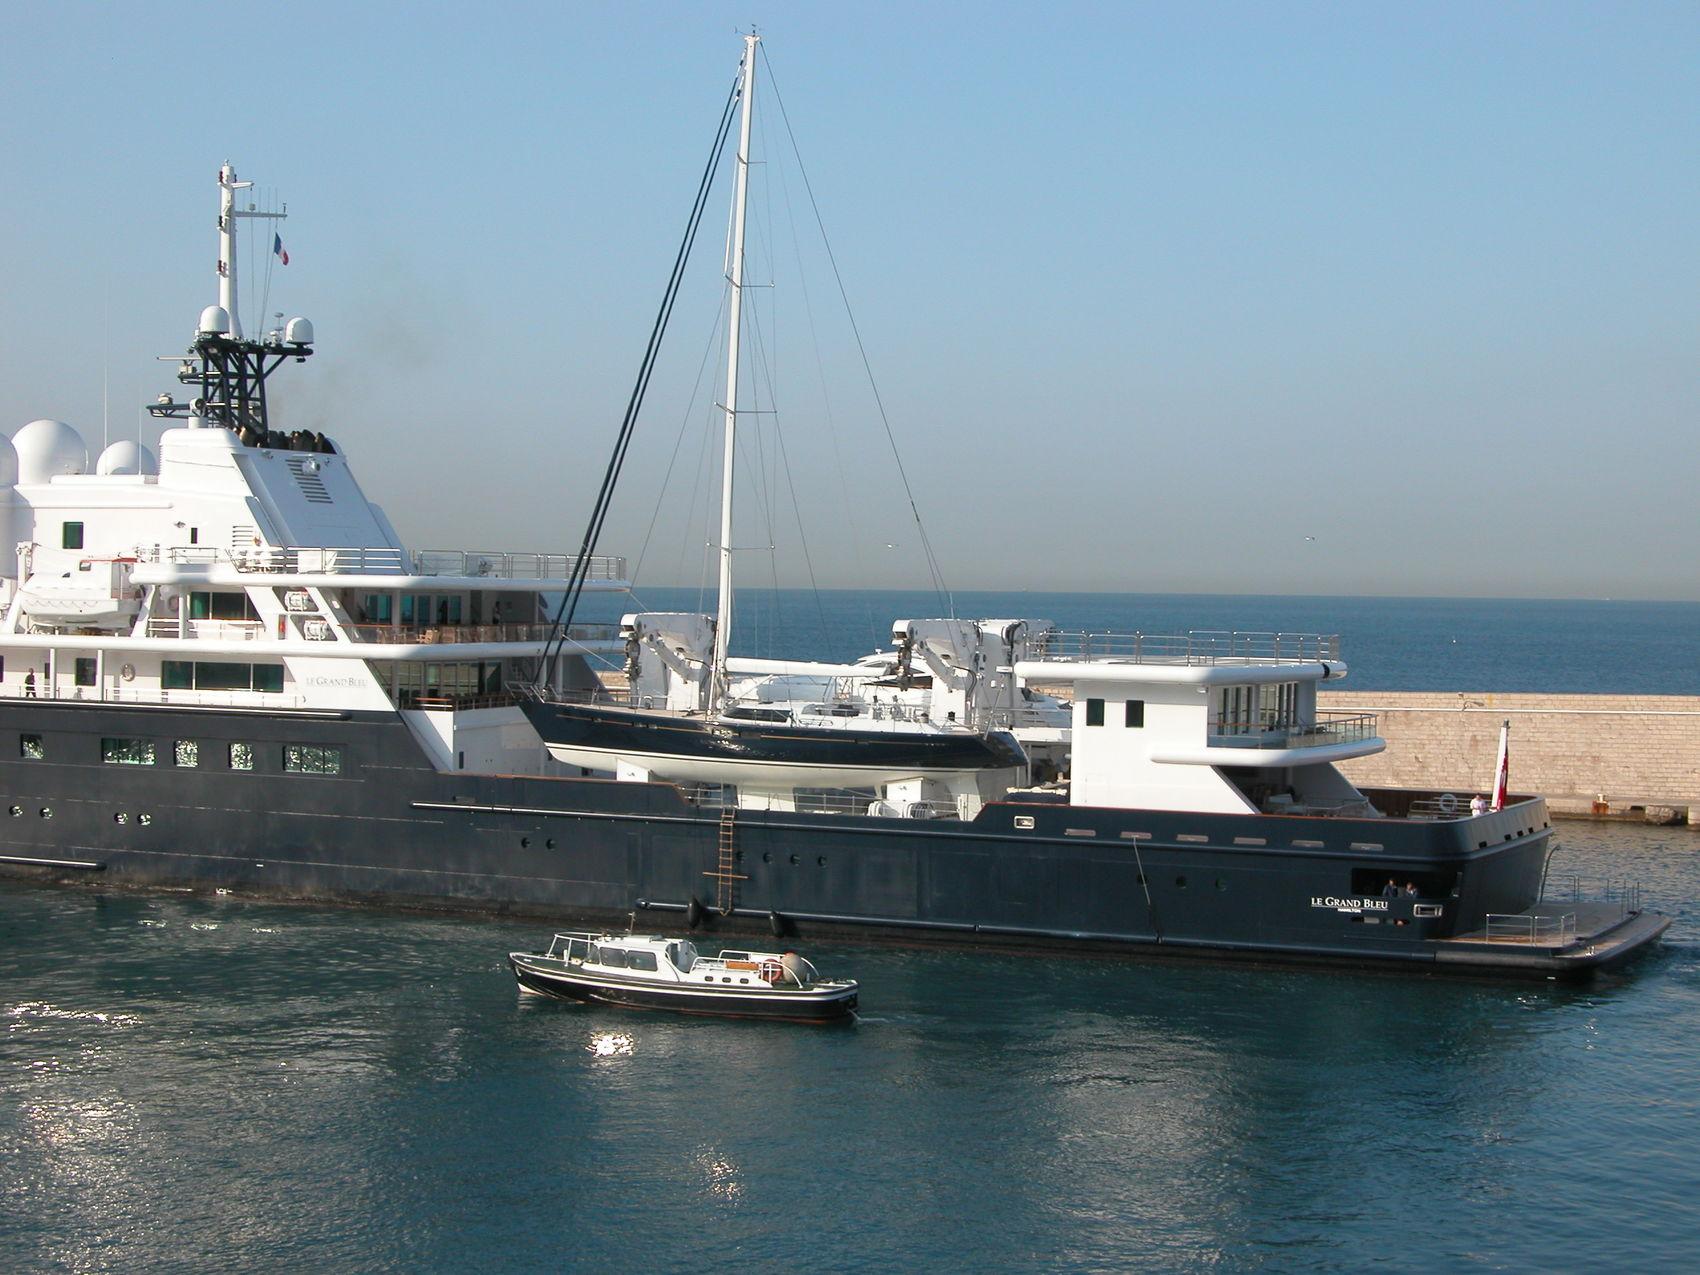 Le Grand Bleu Yacht Superyacht Times